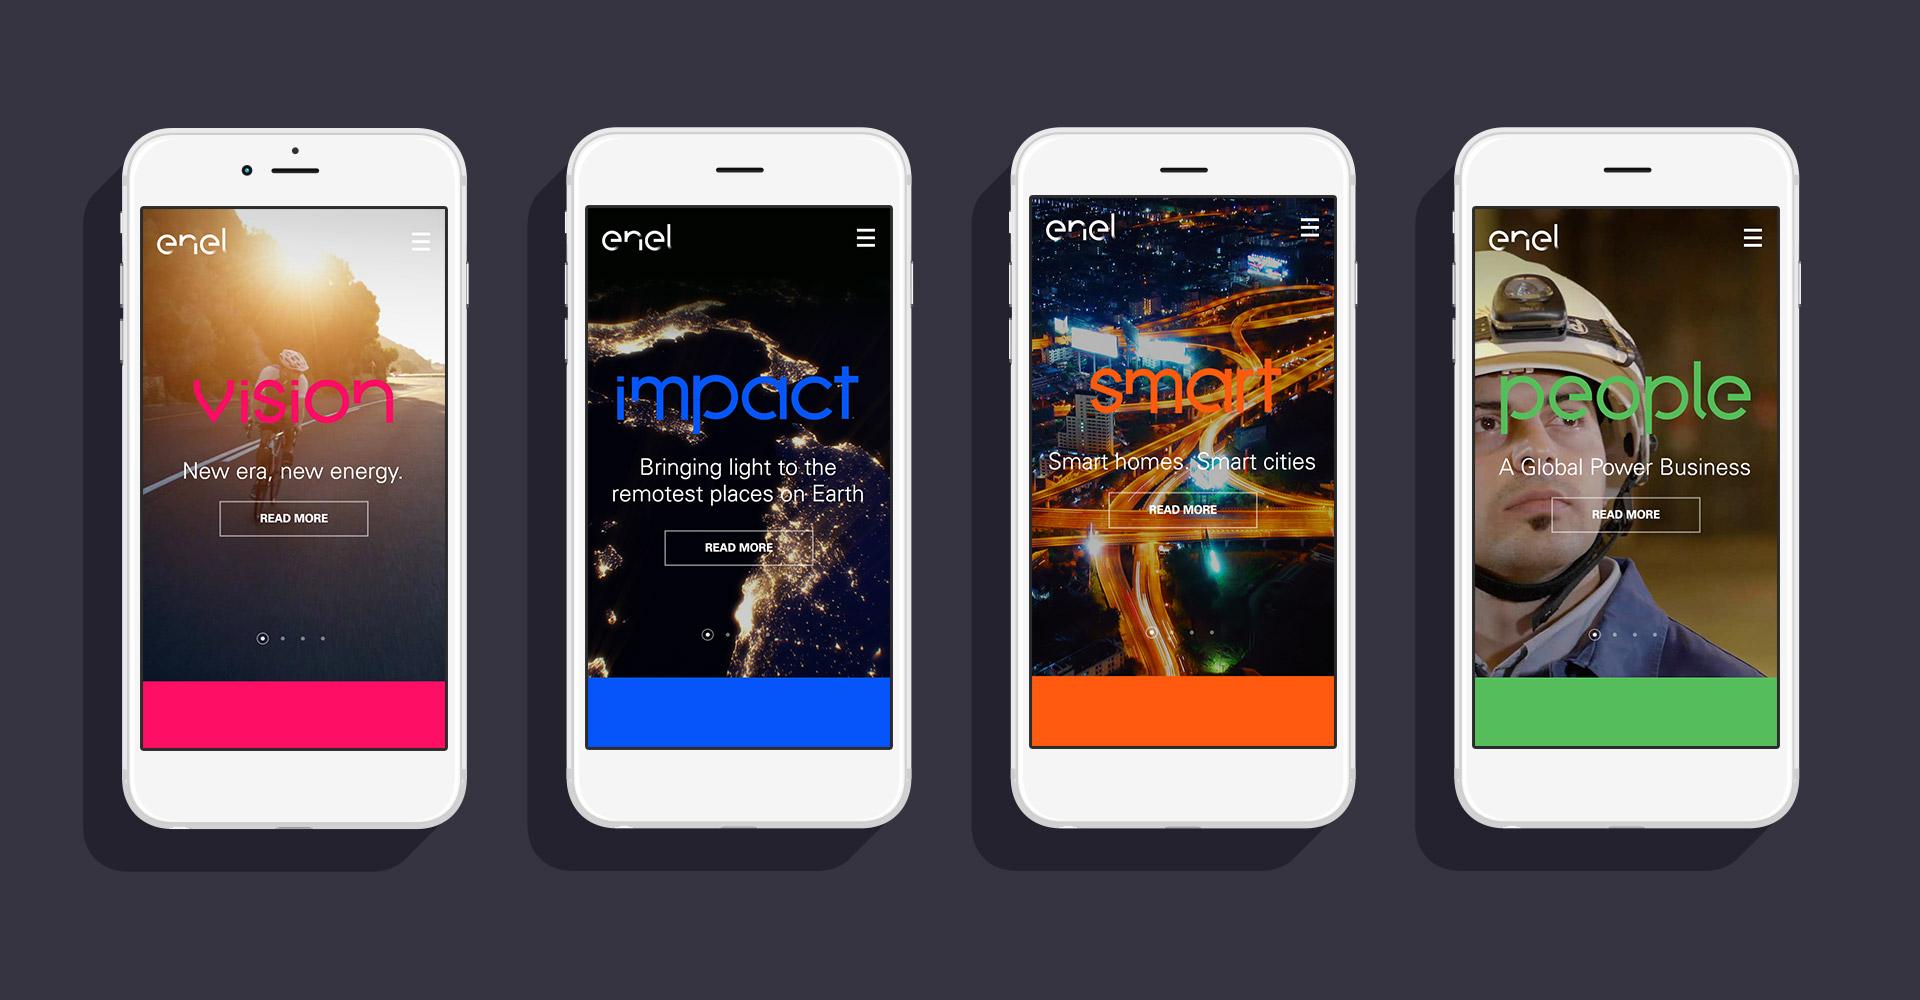 Enel_MVP_Mobile_3